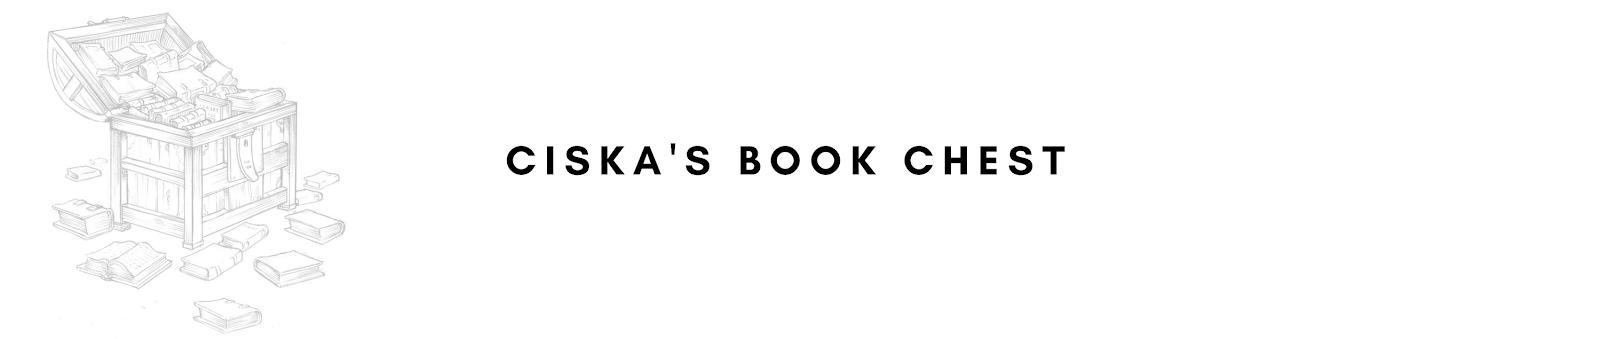 Ciska's Book Chest